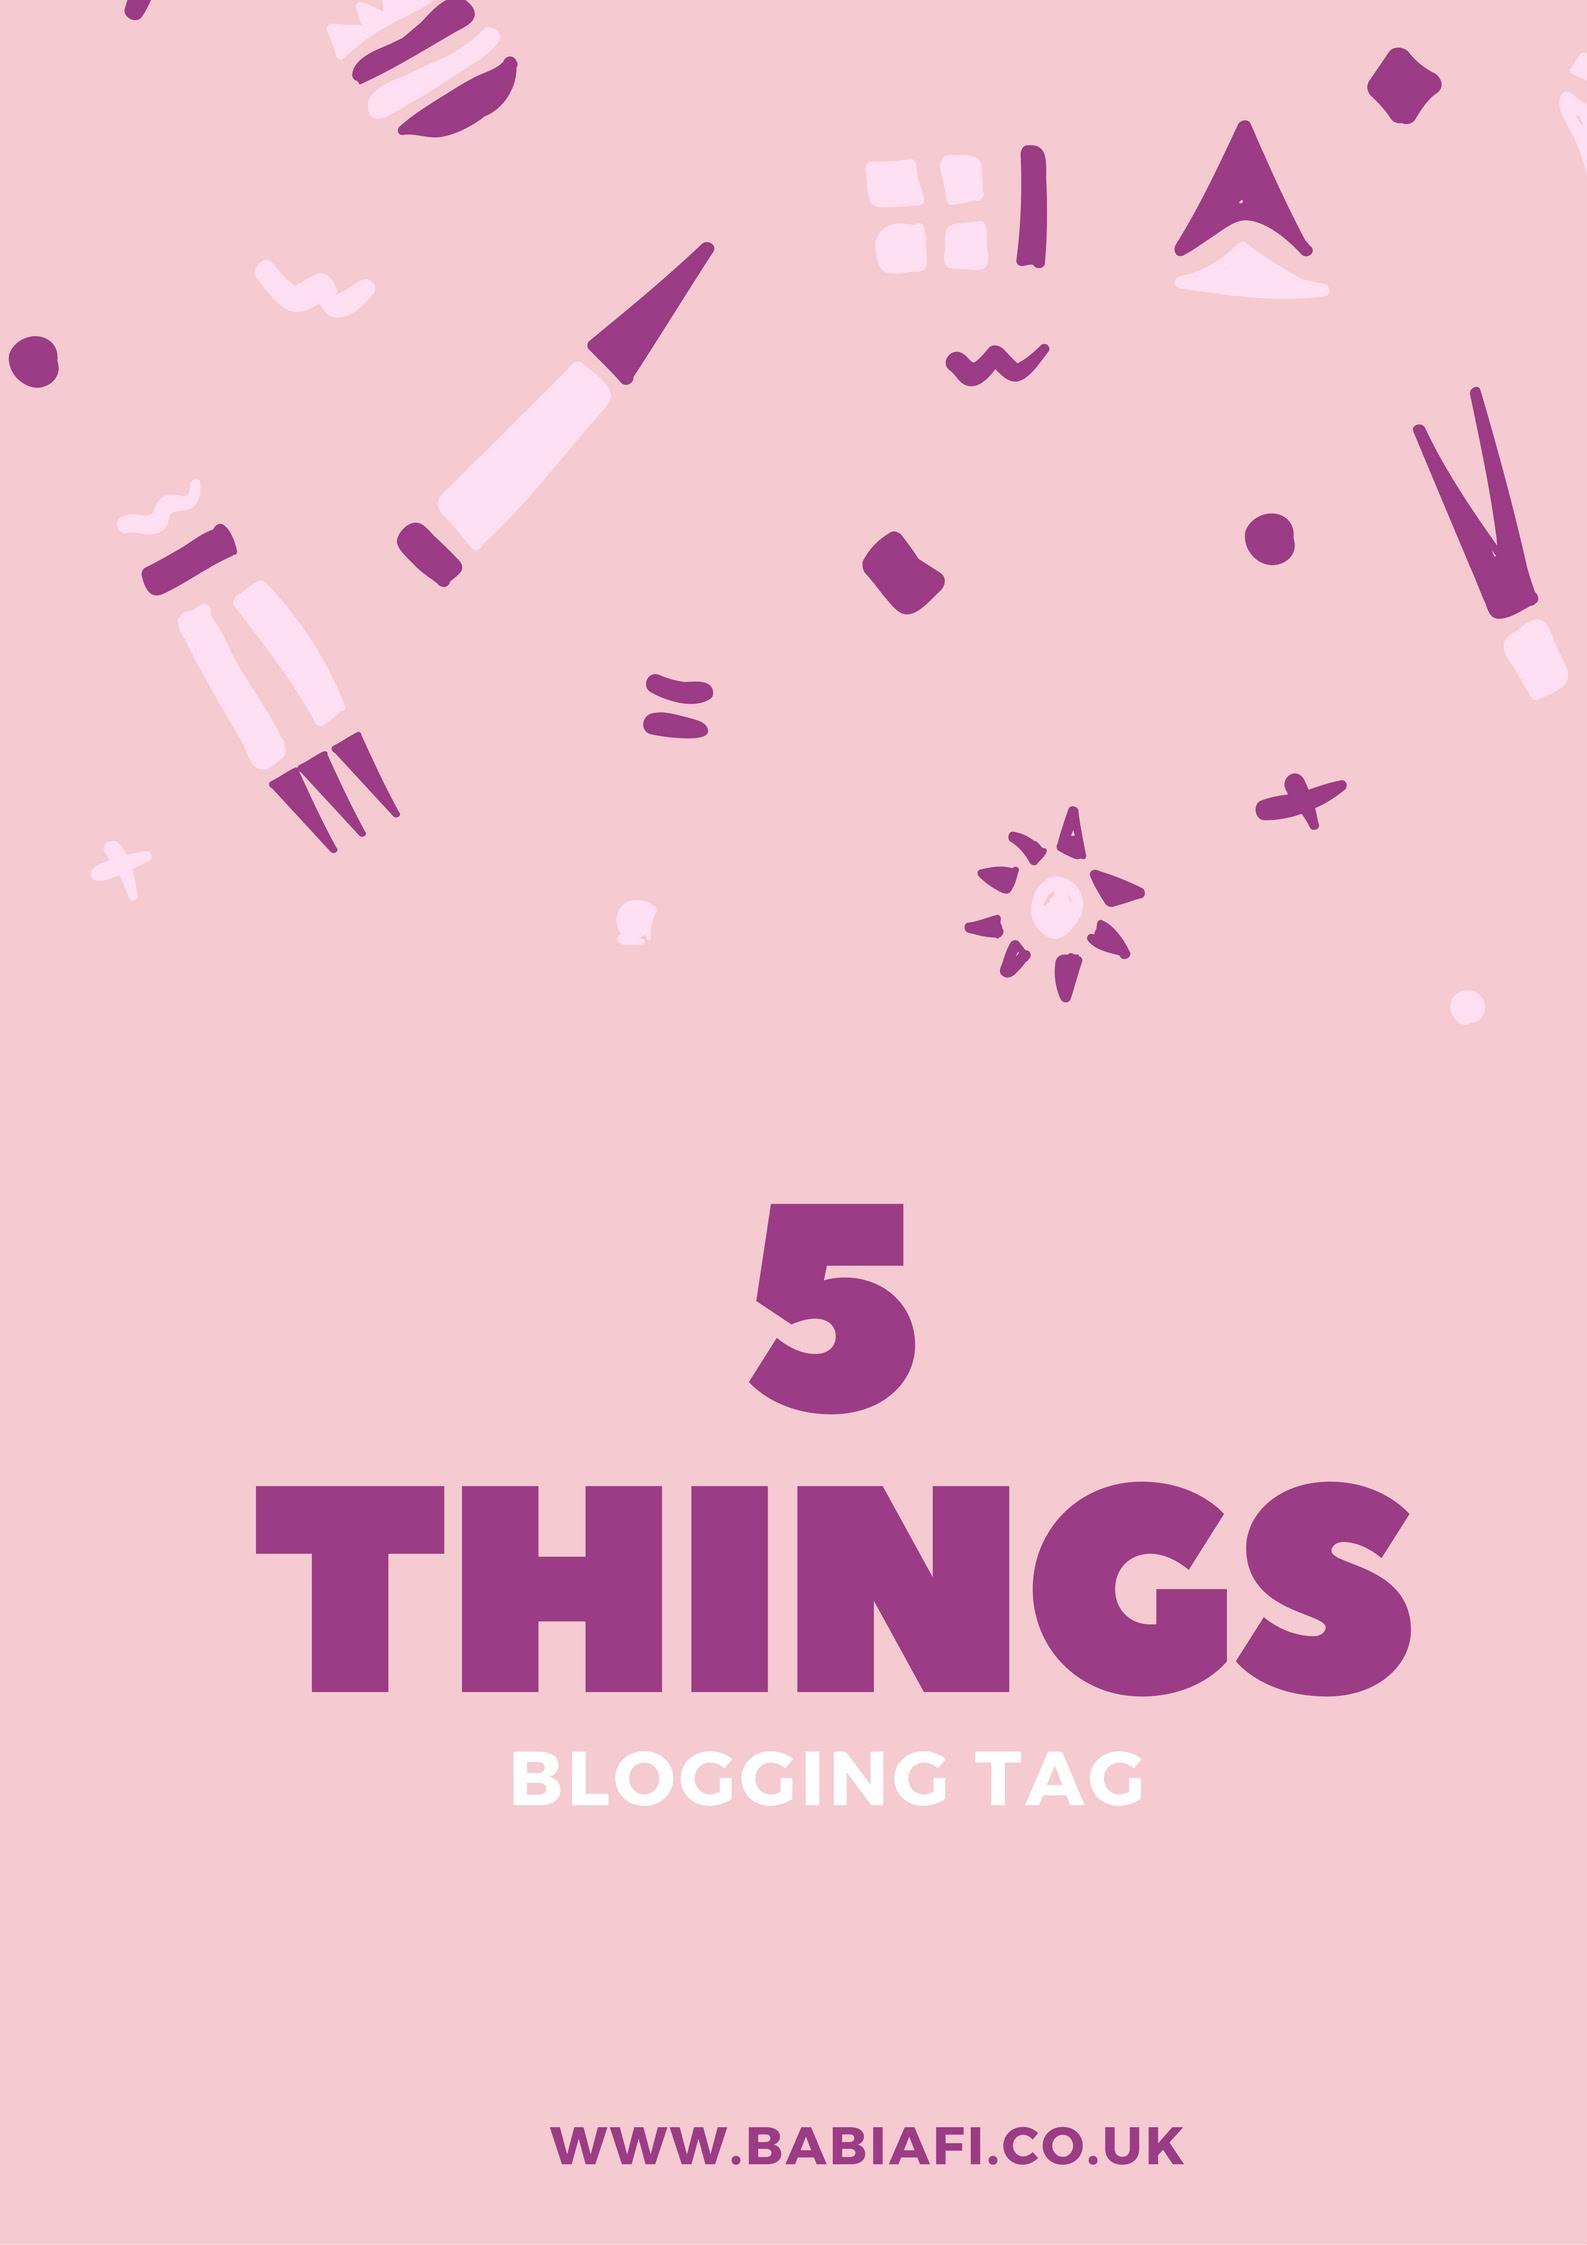 5 Things Blogging Tag